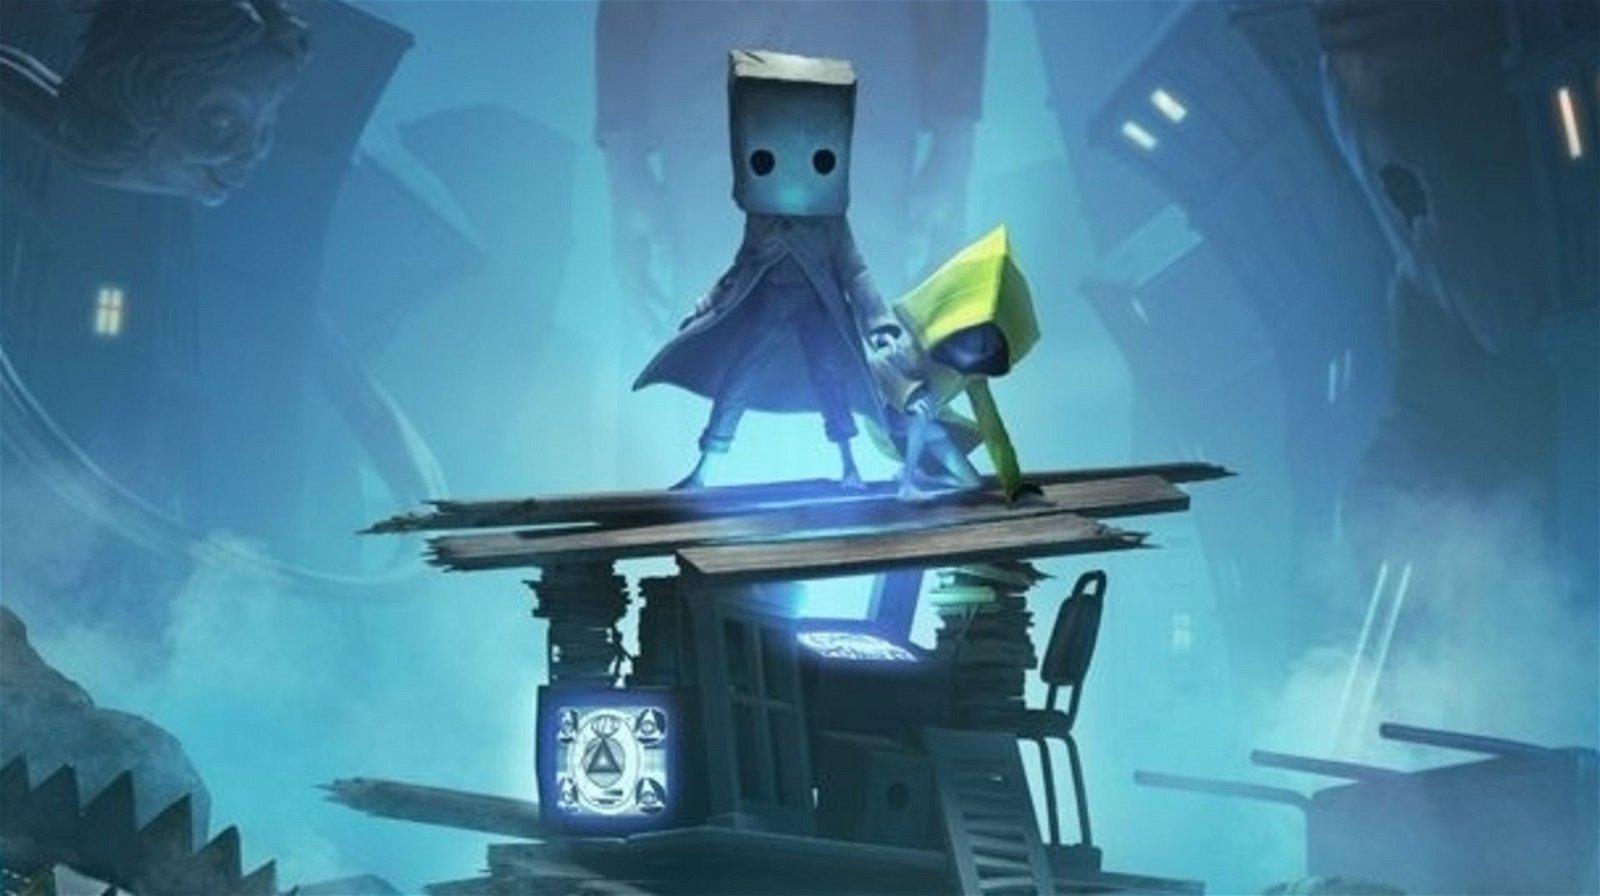 Little Nightmares 2 Gameplay Shown at Gamescom 2020 1